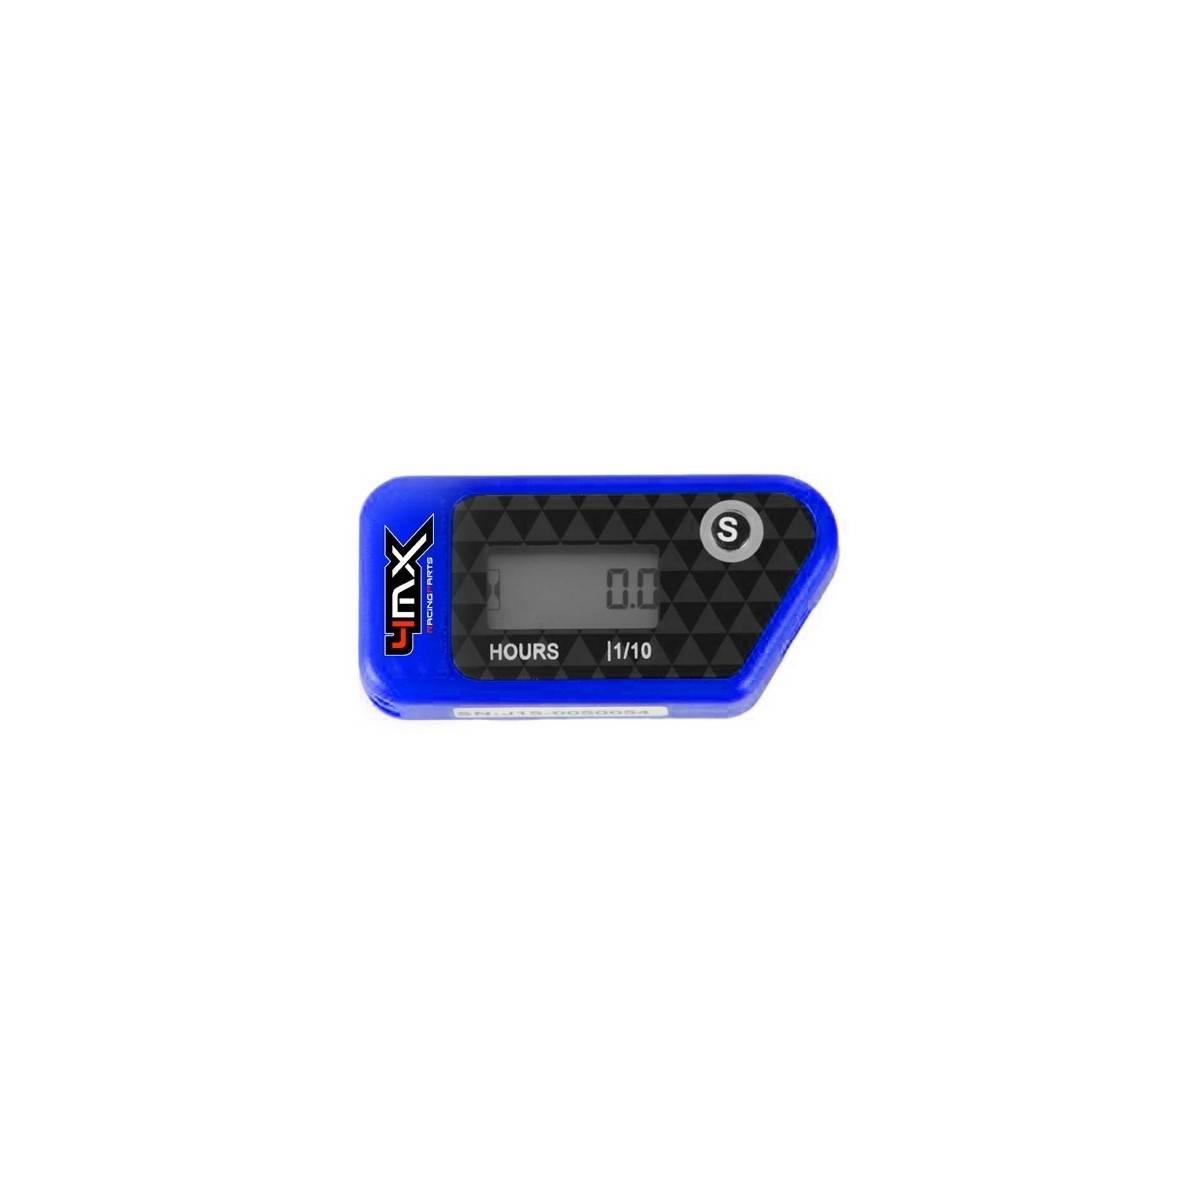 4MXWHM-AZ - Reloj Cuenta Horas 4Mx Vibracion Azul